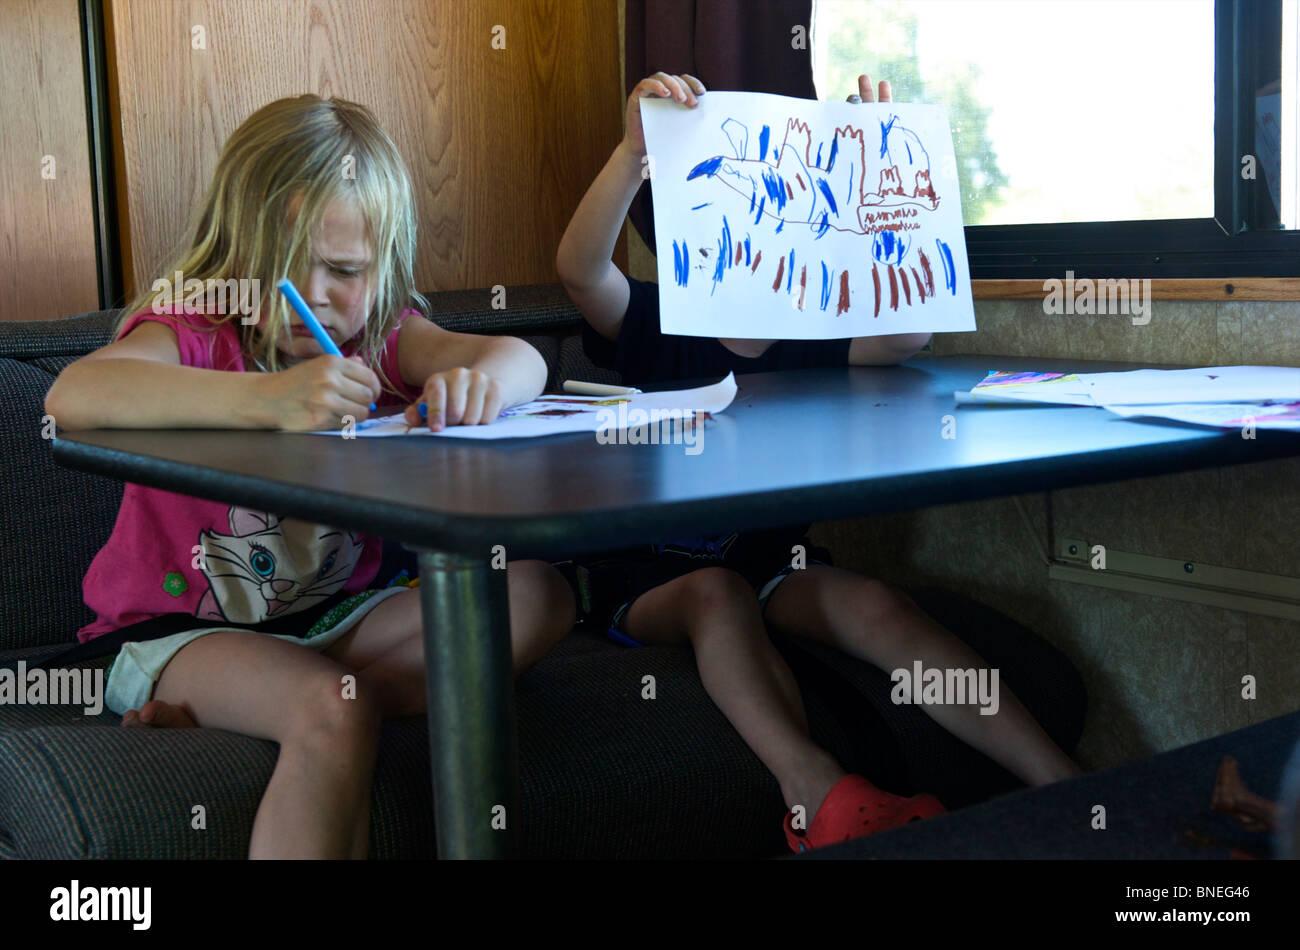 Frère et Sœur dessin dans un camping-car RV, Texas, U.S.A Banque D'Images